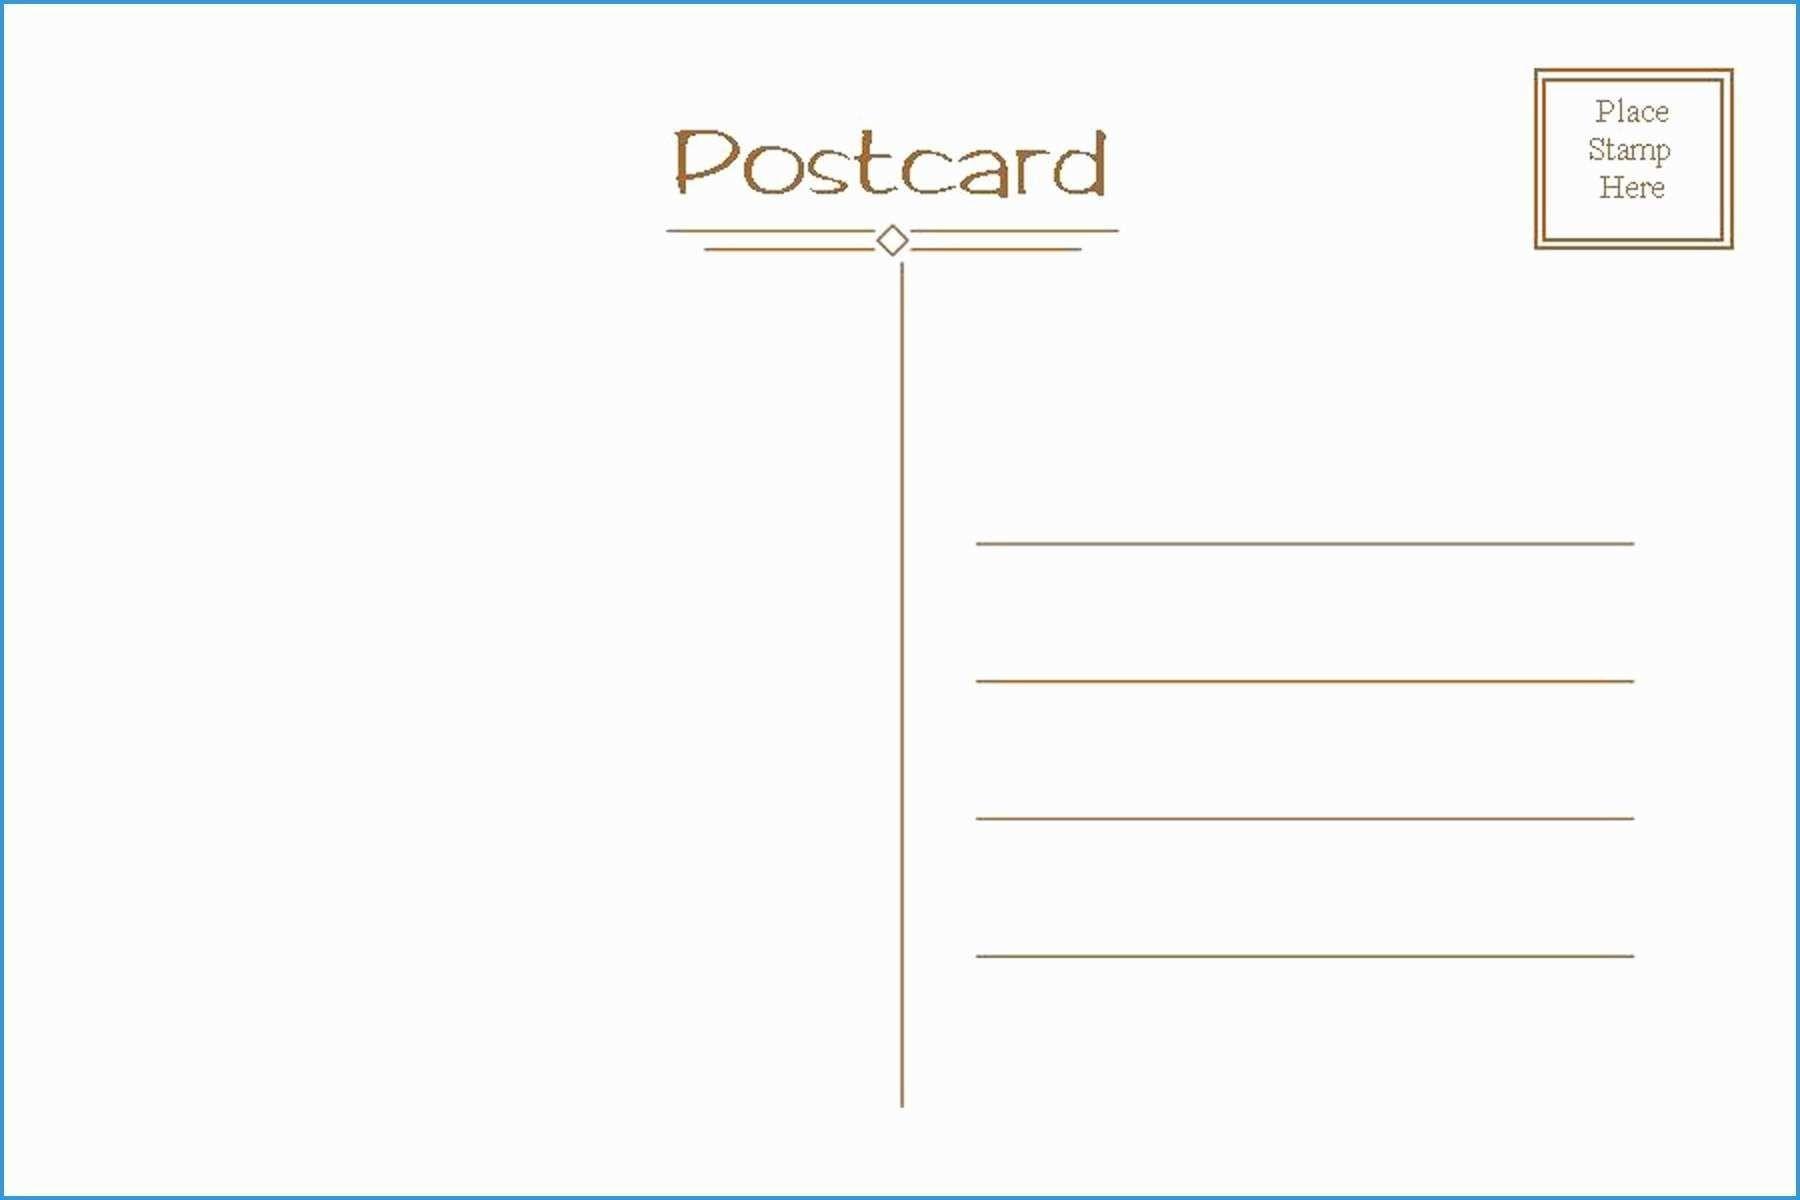 006 Fascinating Free Postcard Template Download Microsoft Word Example Full